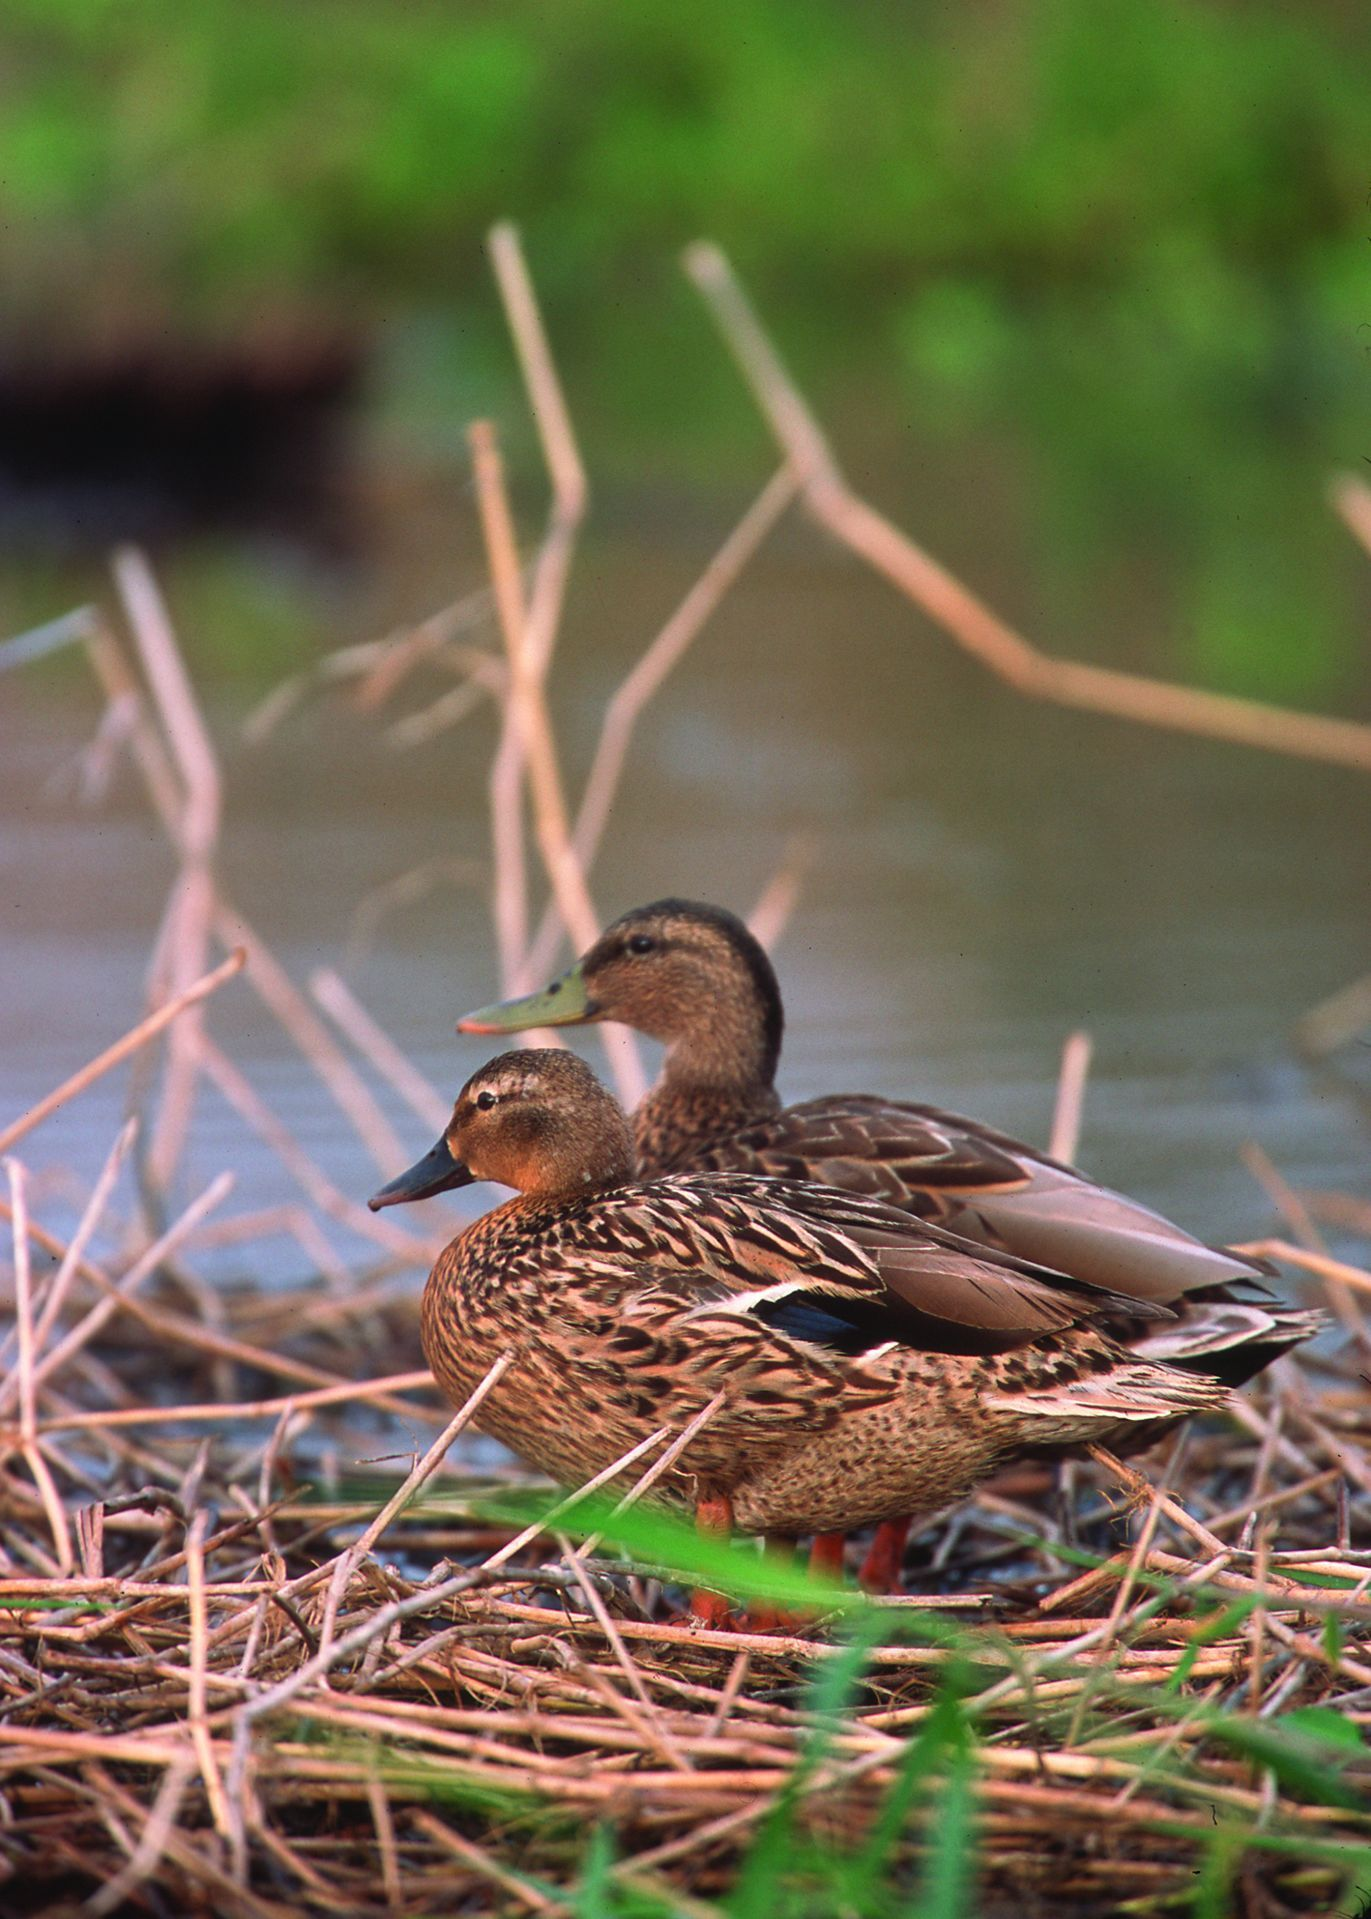 Hawaiian duck (With images) List of birds, World birds